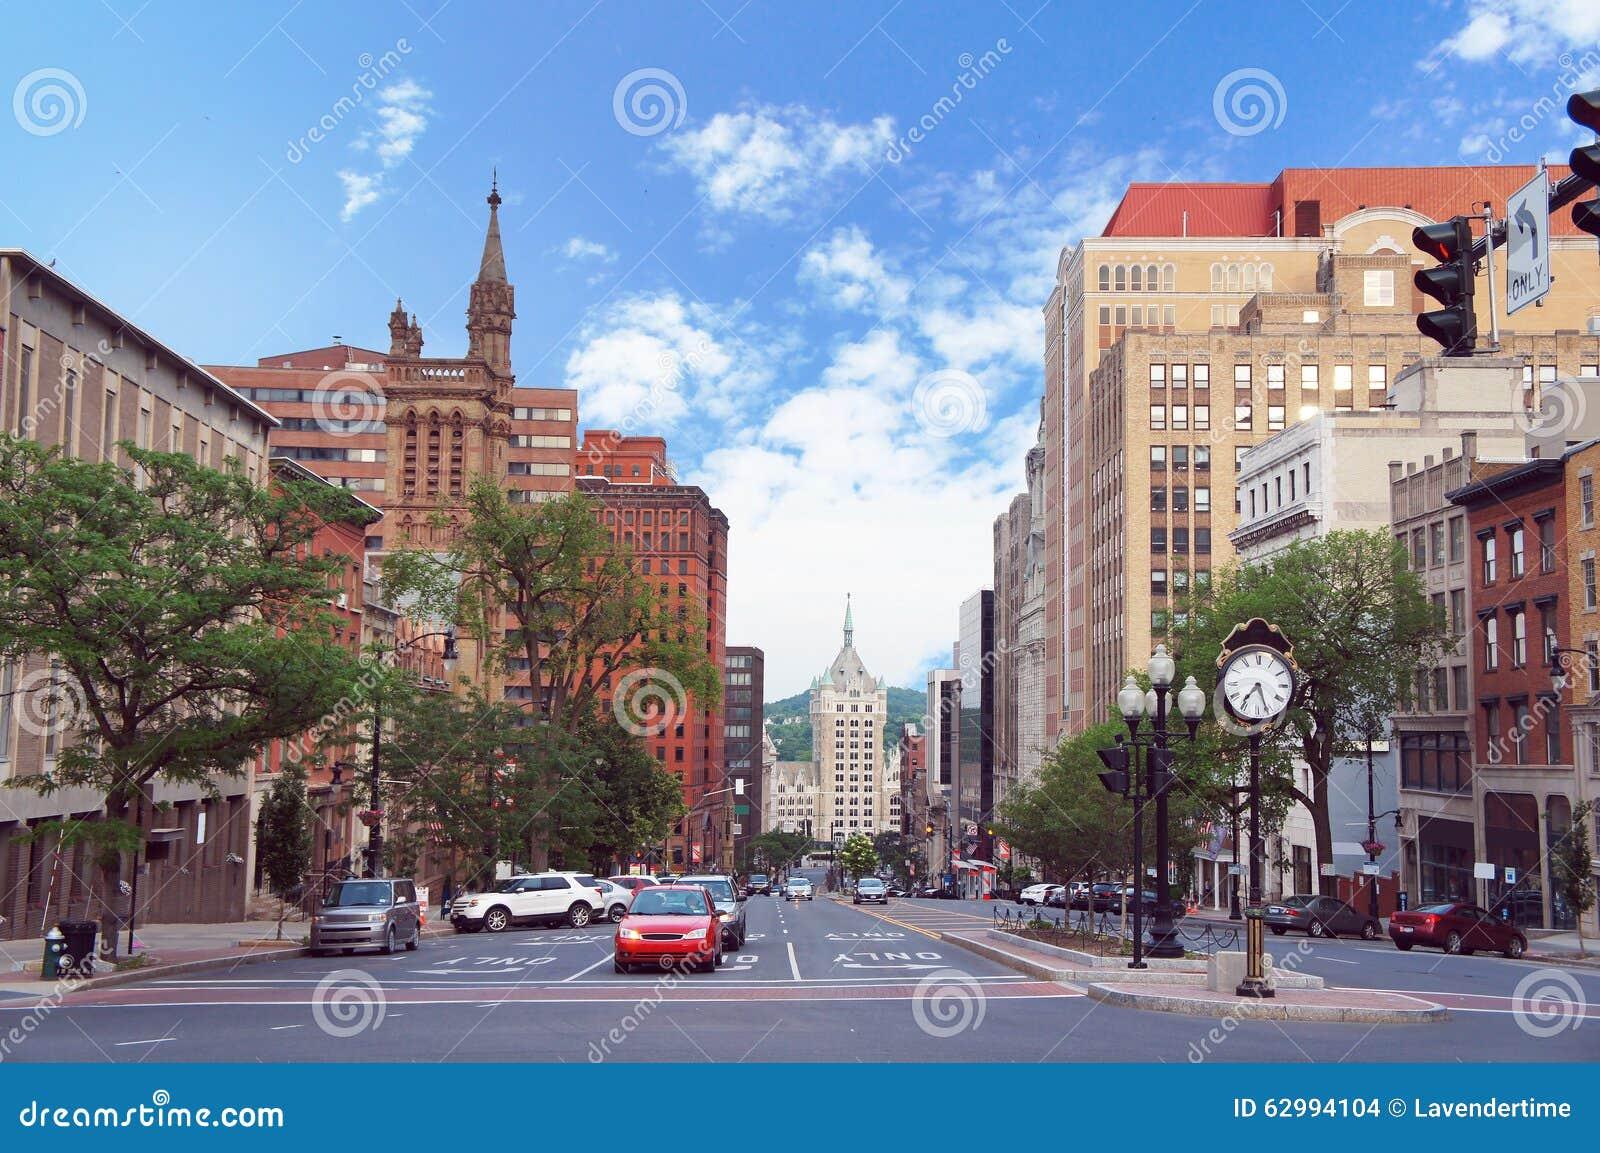 Adult Jobs, Employment in Albany, NY Indeedcom